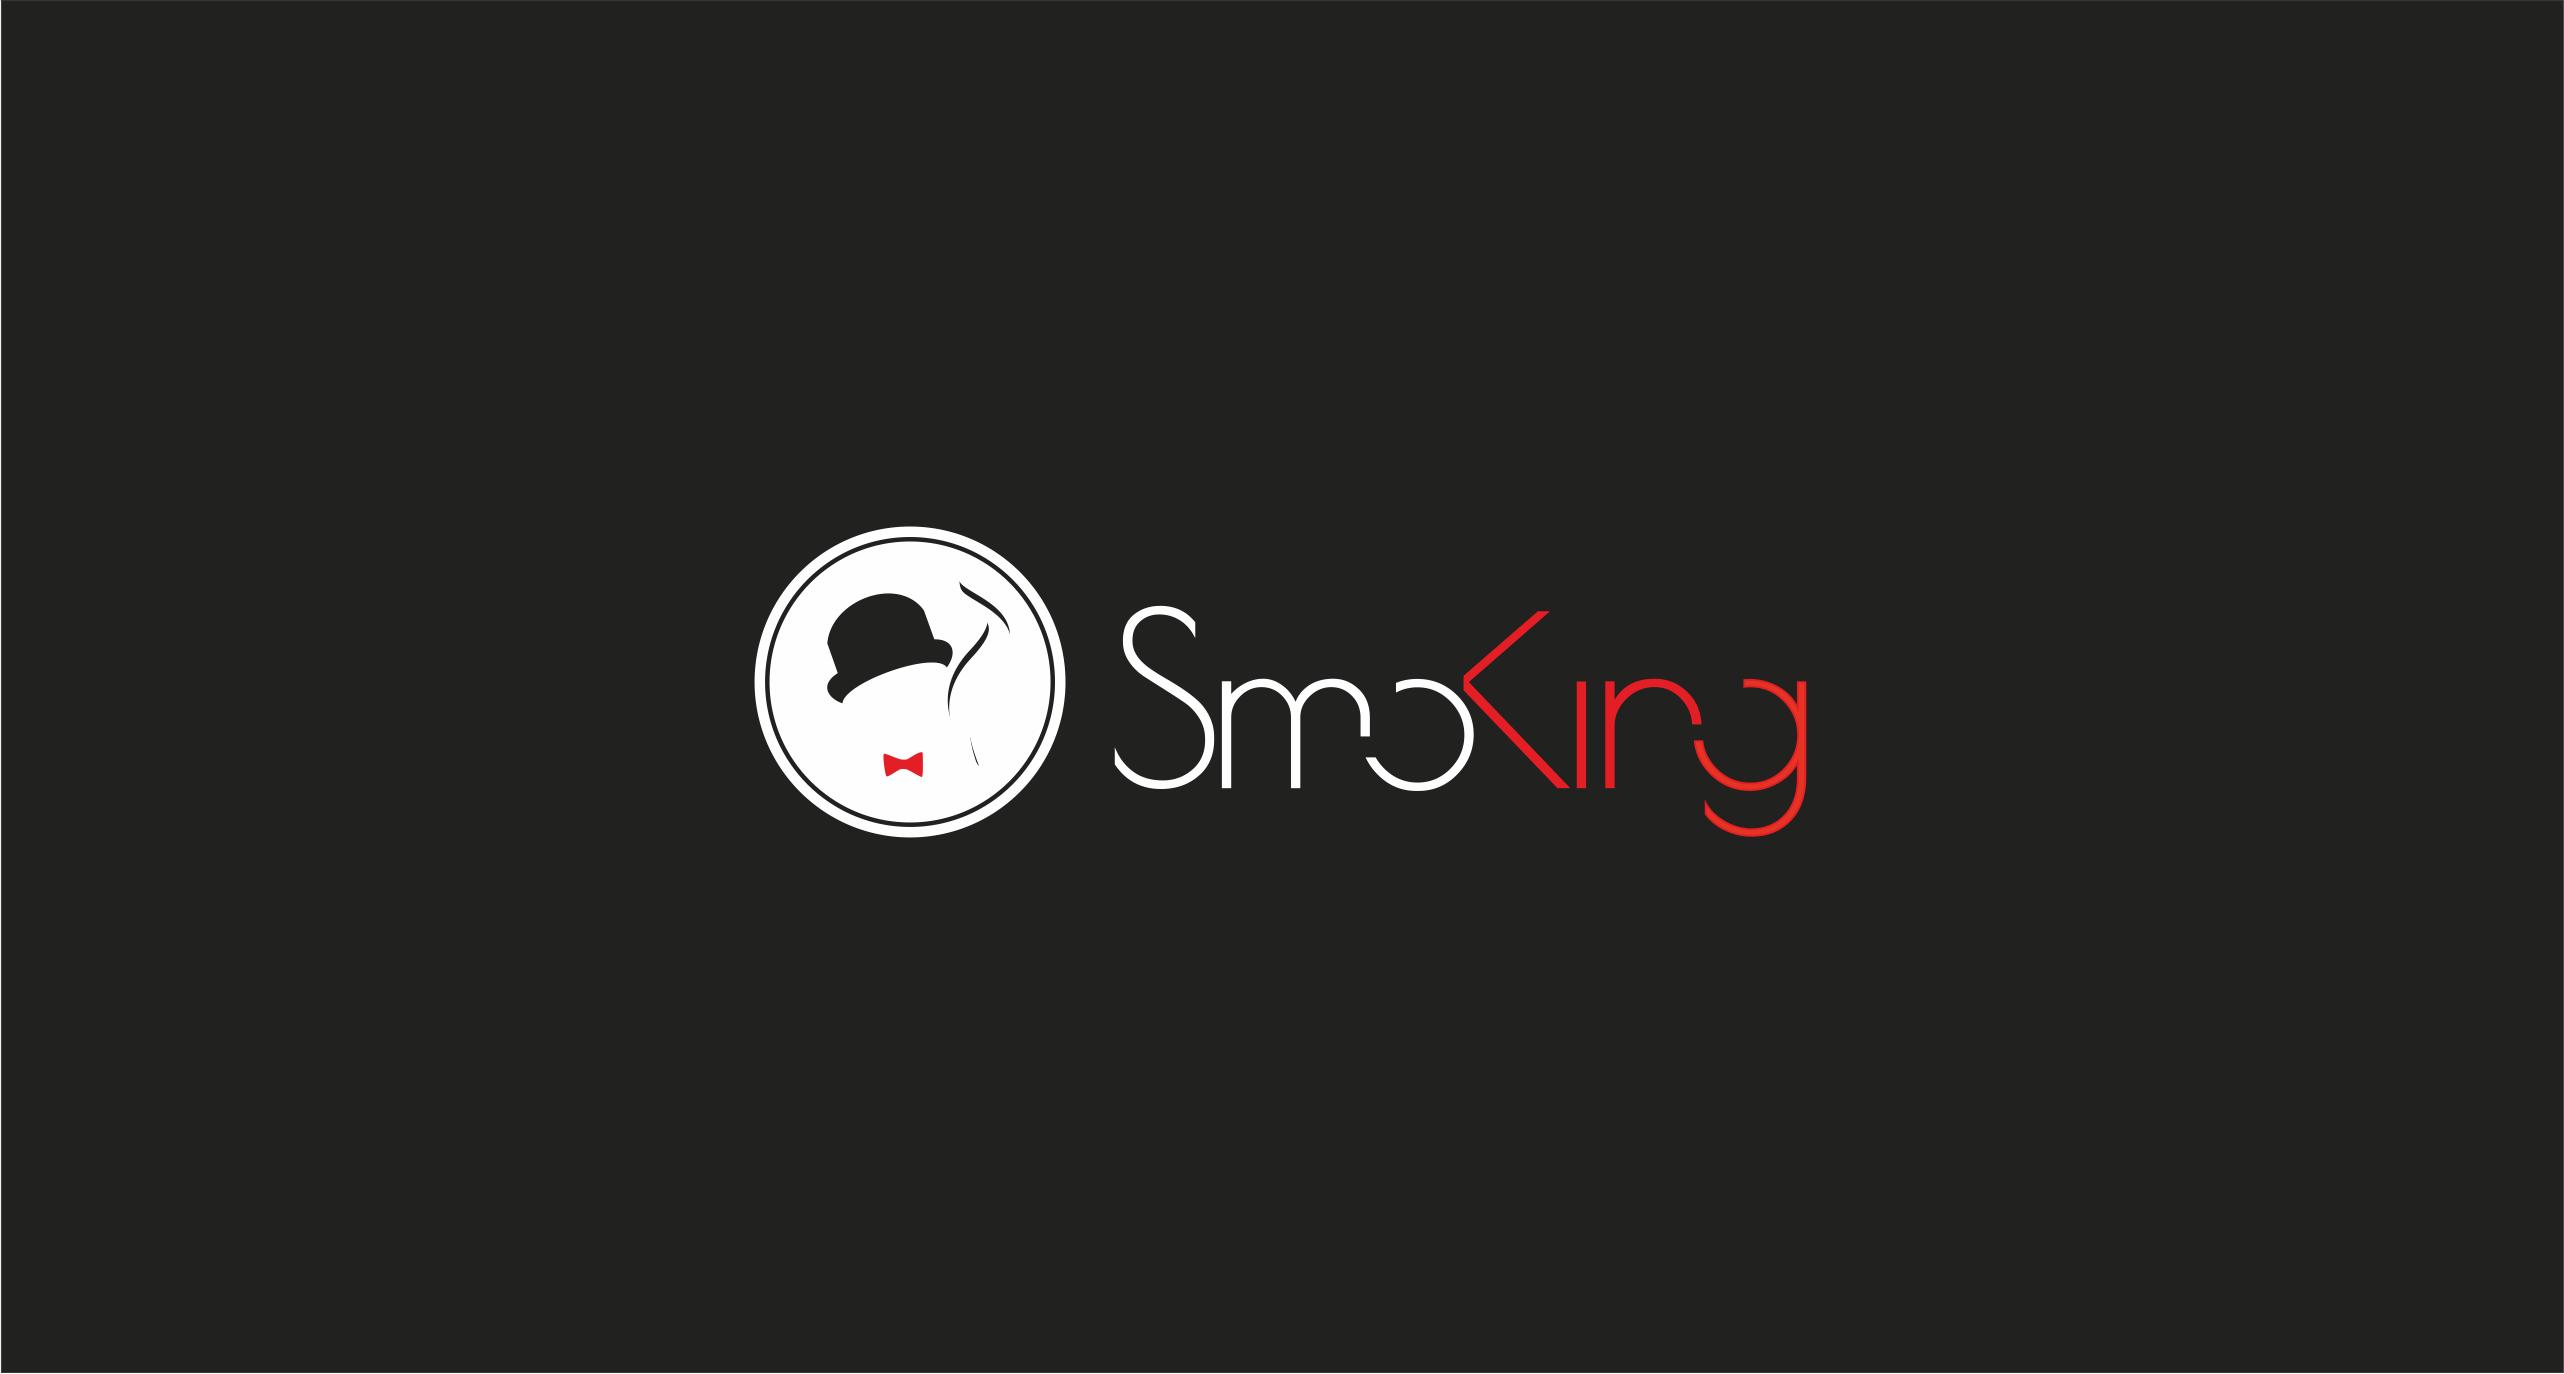 projekt logo epapierosy